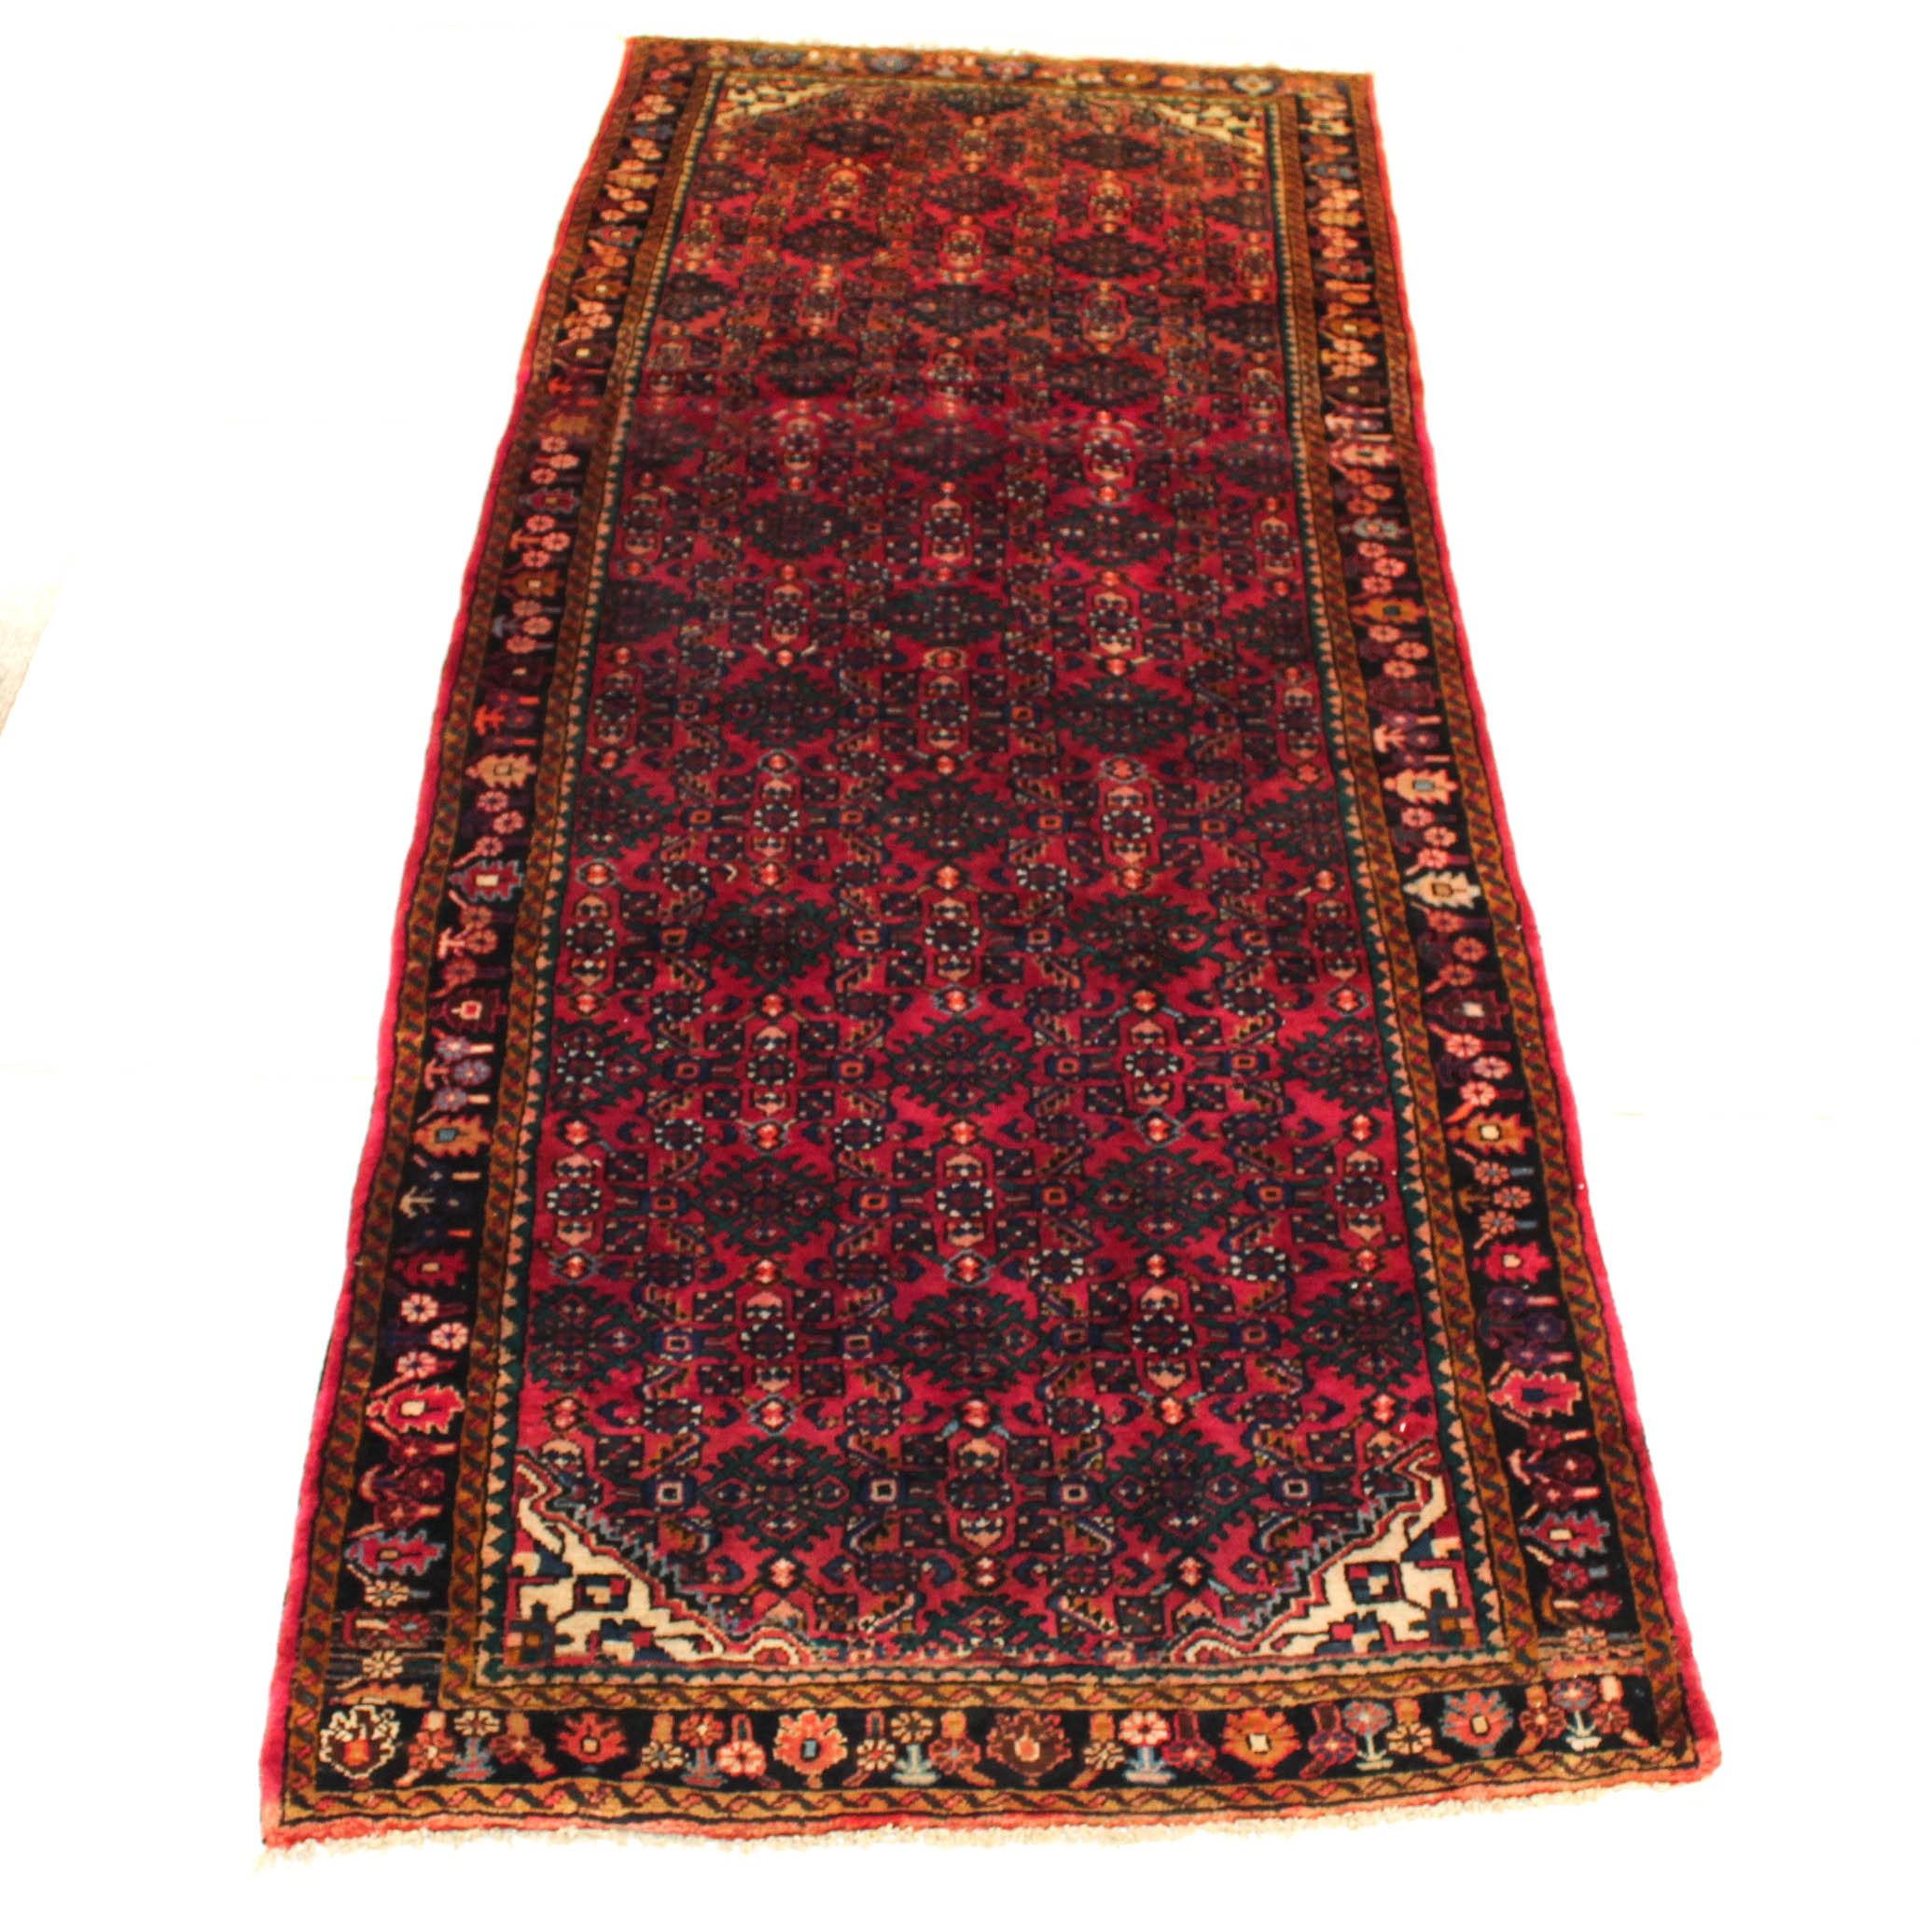 Vintage Hand-Knotted Persian Lilihan Sarouk Rug